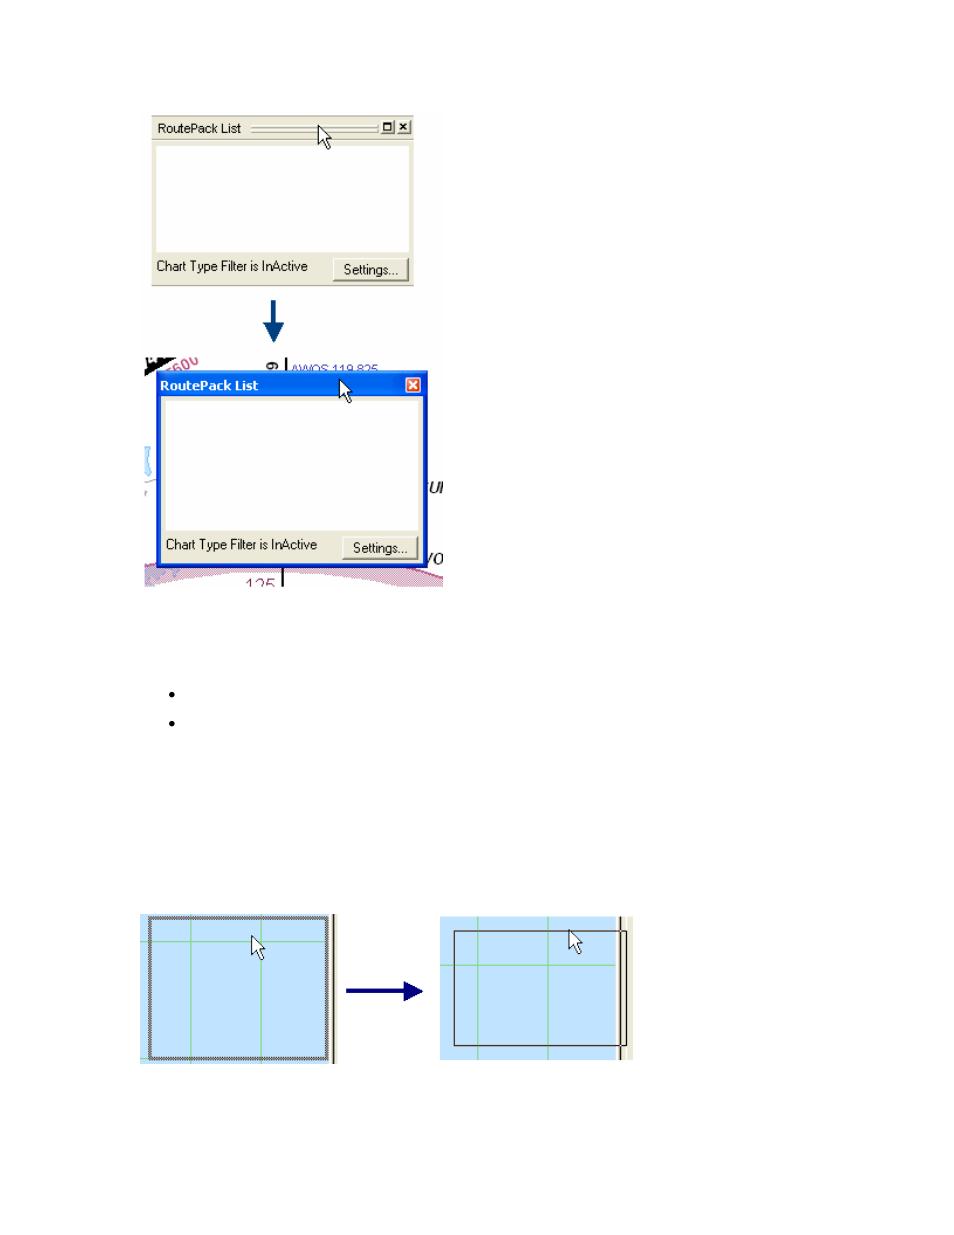 docking the list window resizing a list window jeppesen jeppview rh manualsdir com Guide Book Blip Scale User's Guide